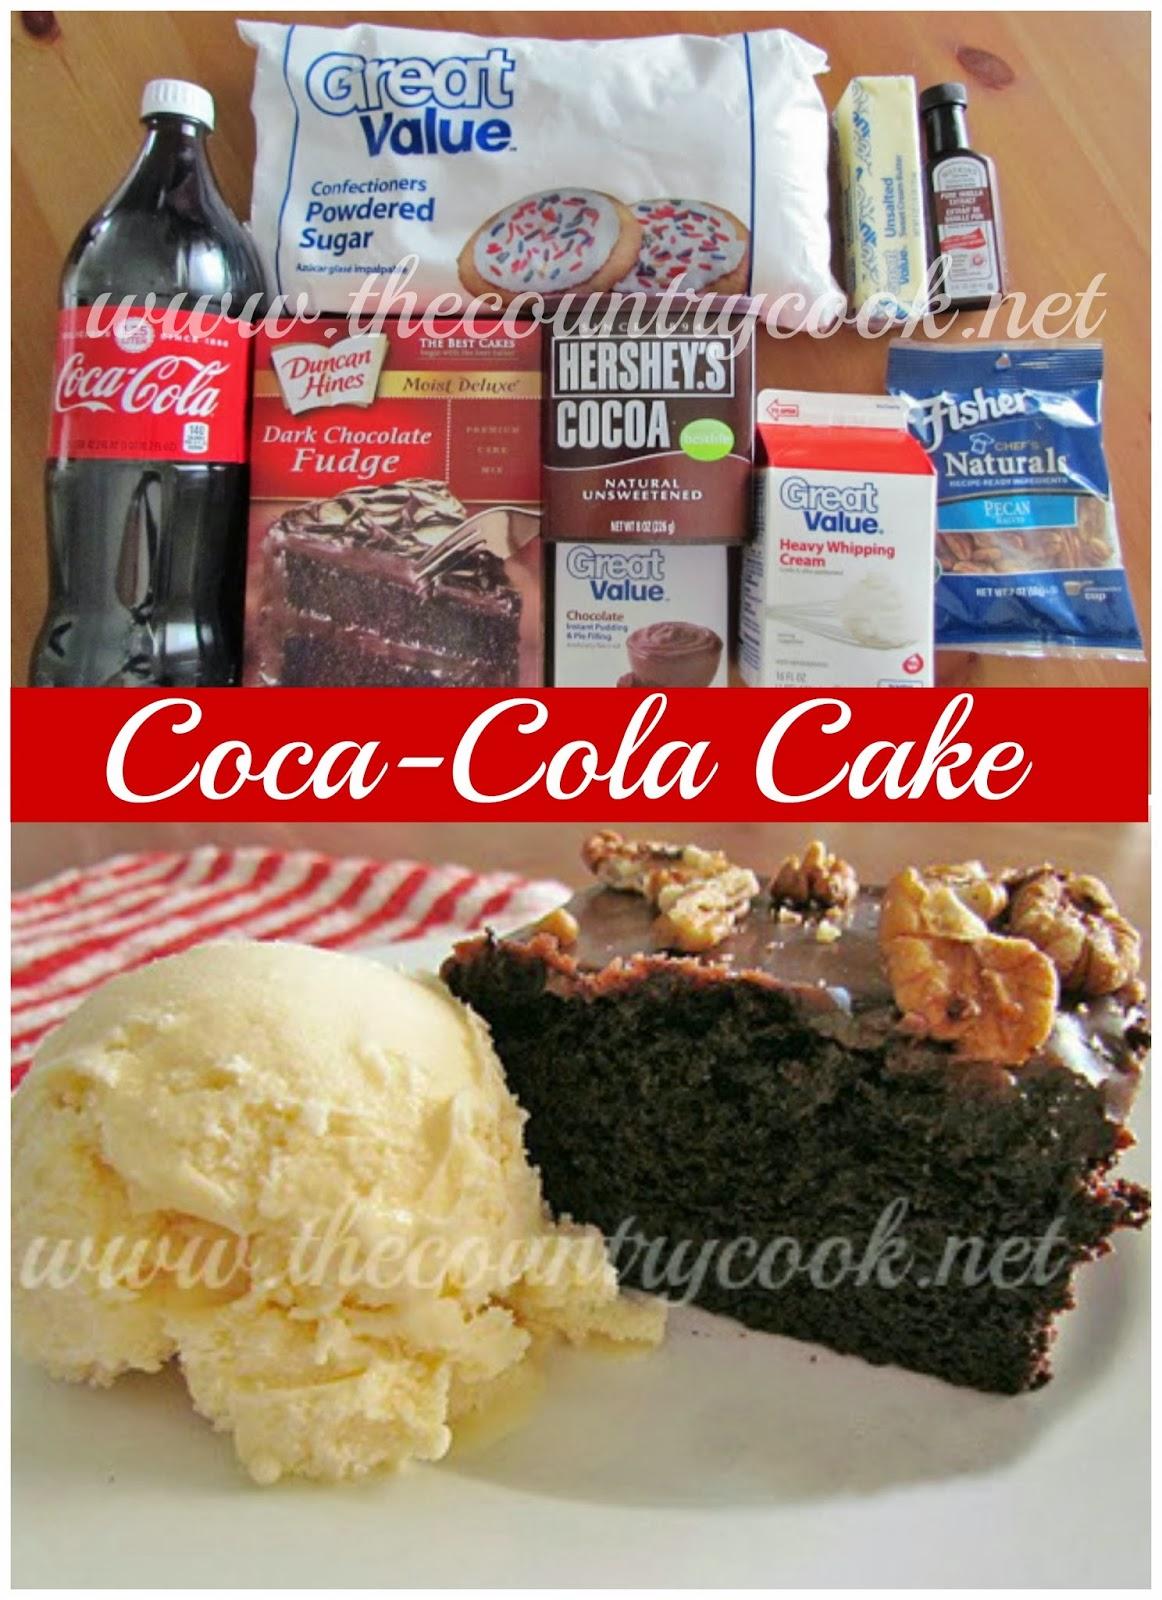 Diet Coke Cake Mix